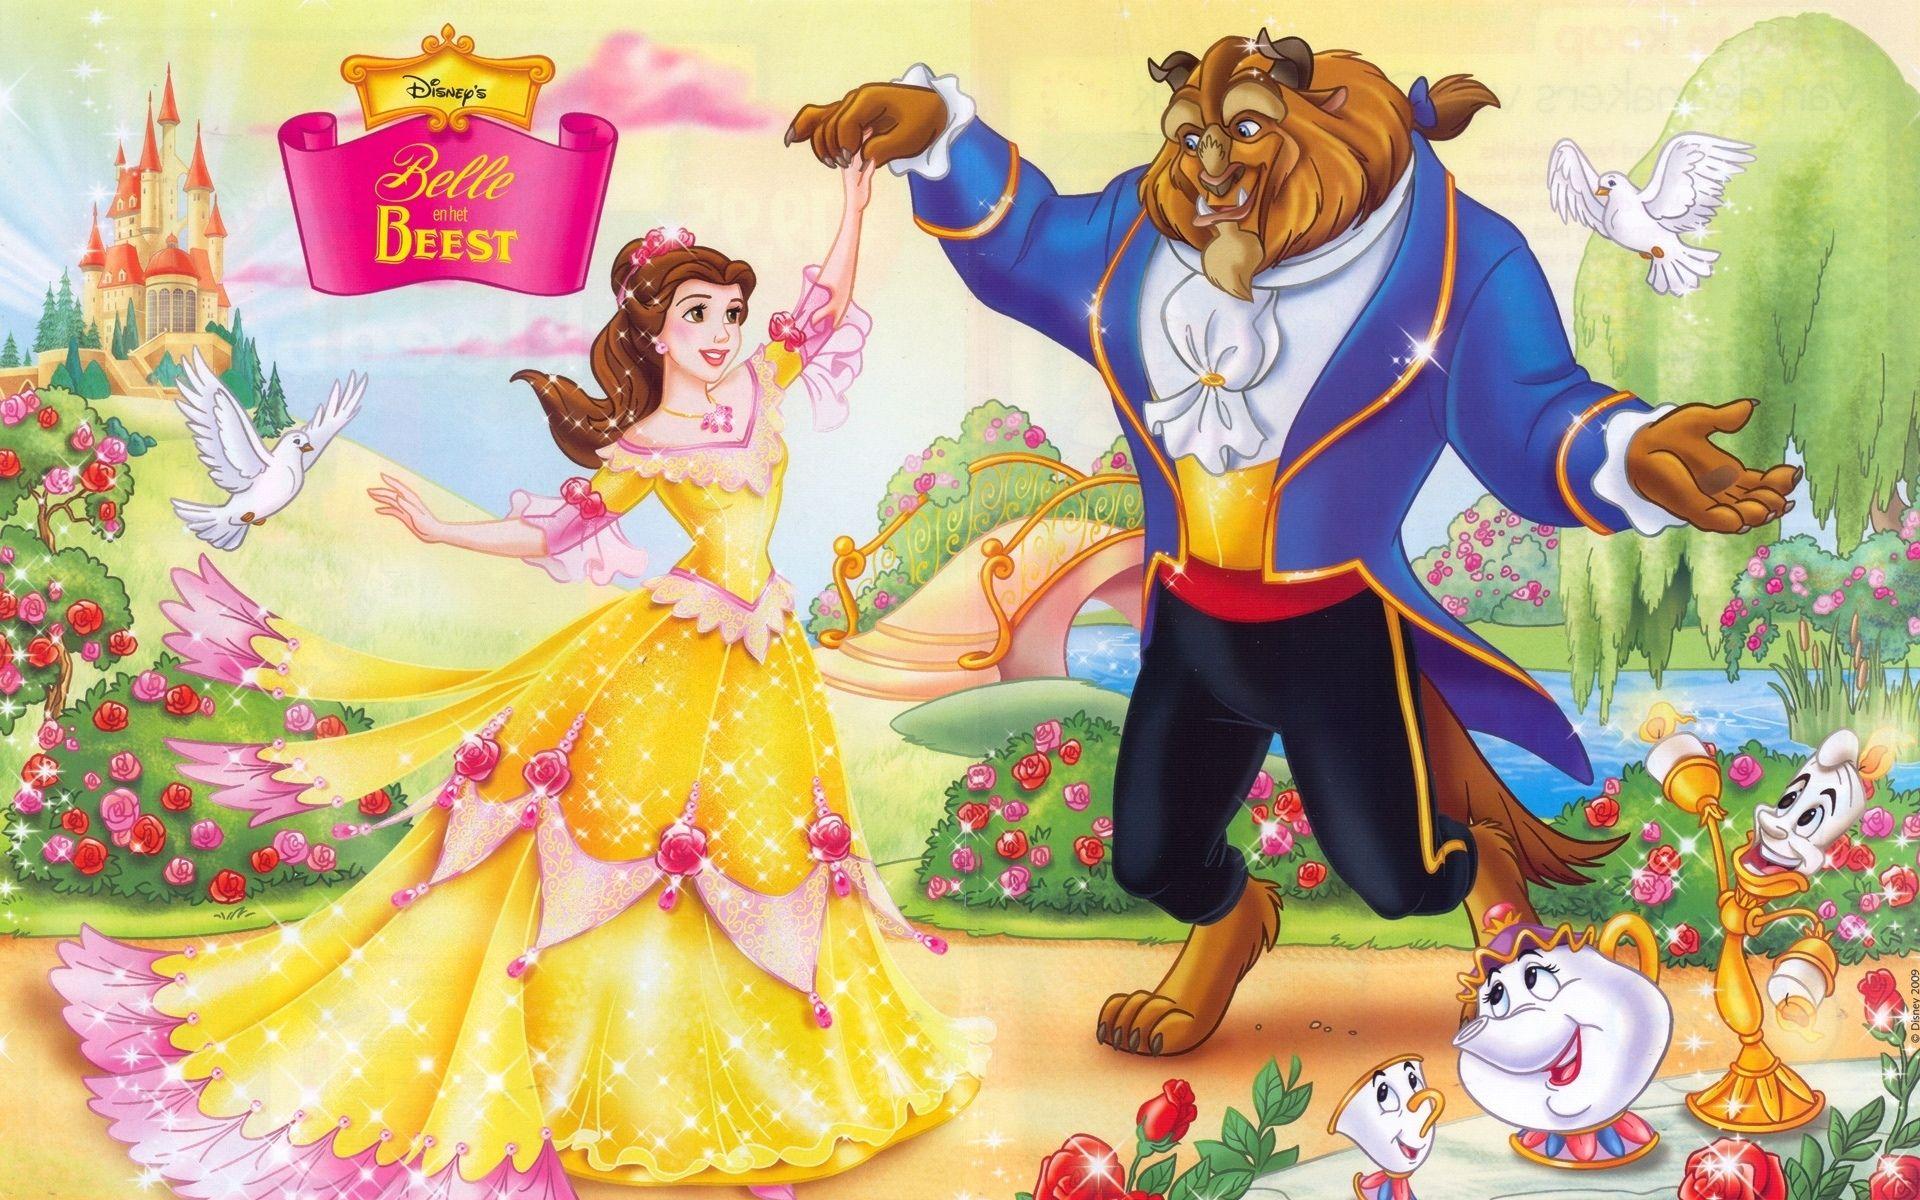 Princess Belle Adam Beast Beauty And The Beast 1991 Beauty And The Beast Wallpaper Disney Princess Wallpaper Disney Beauty And The Beast